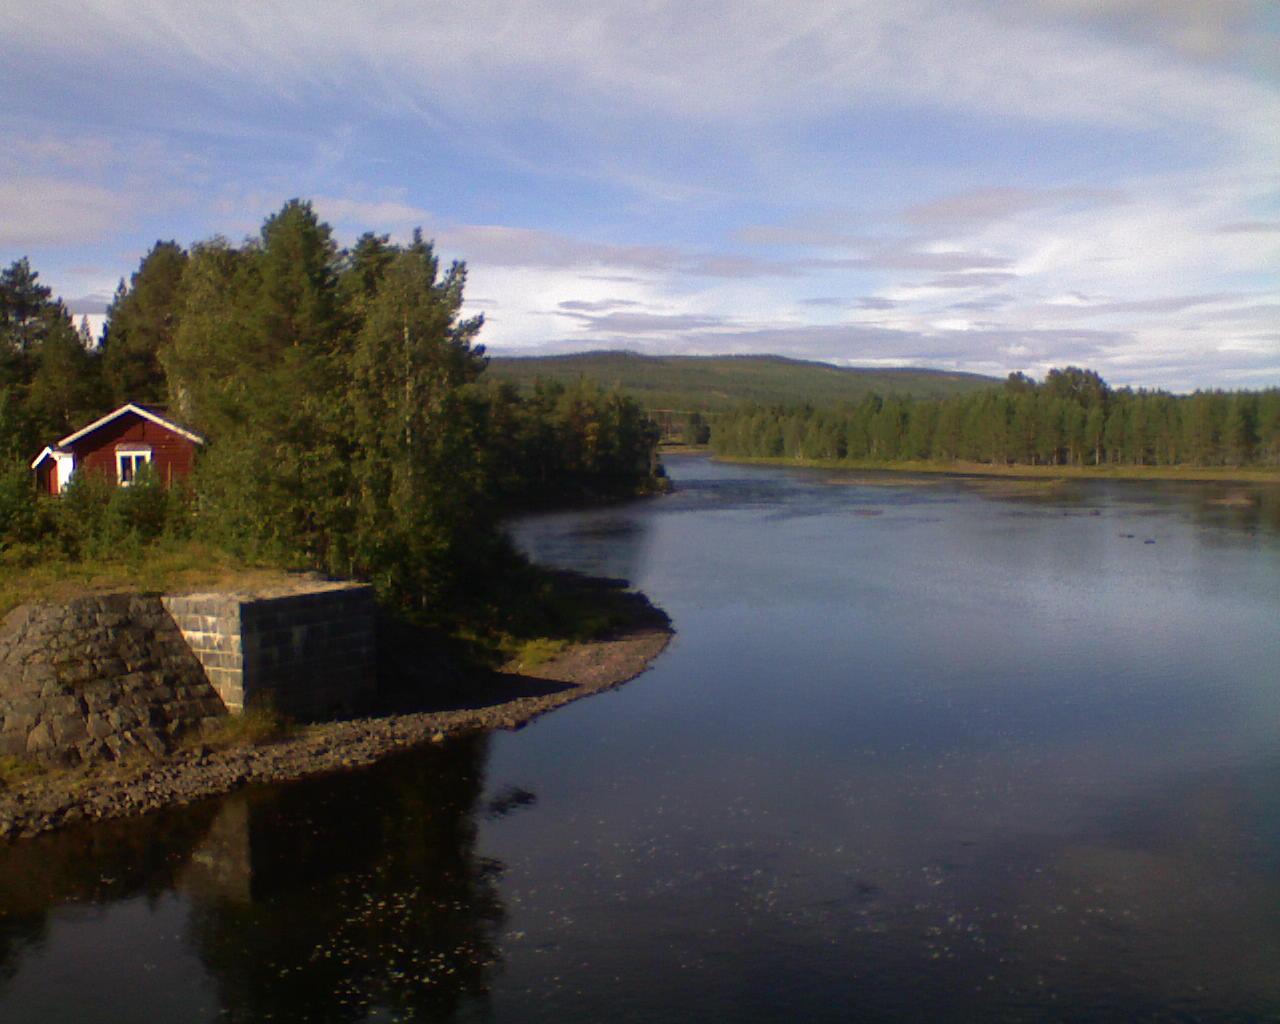 Idre Sweden  city pictures gallery : Description Sweden. Dalarna County. Älvdalen Municipality.Idre1